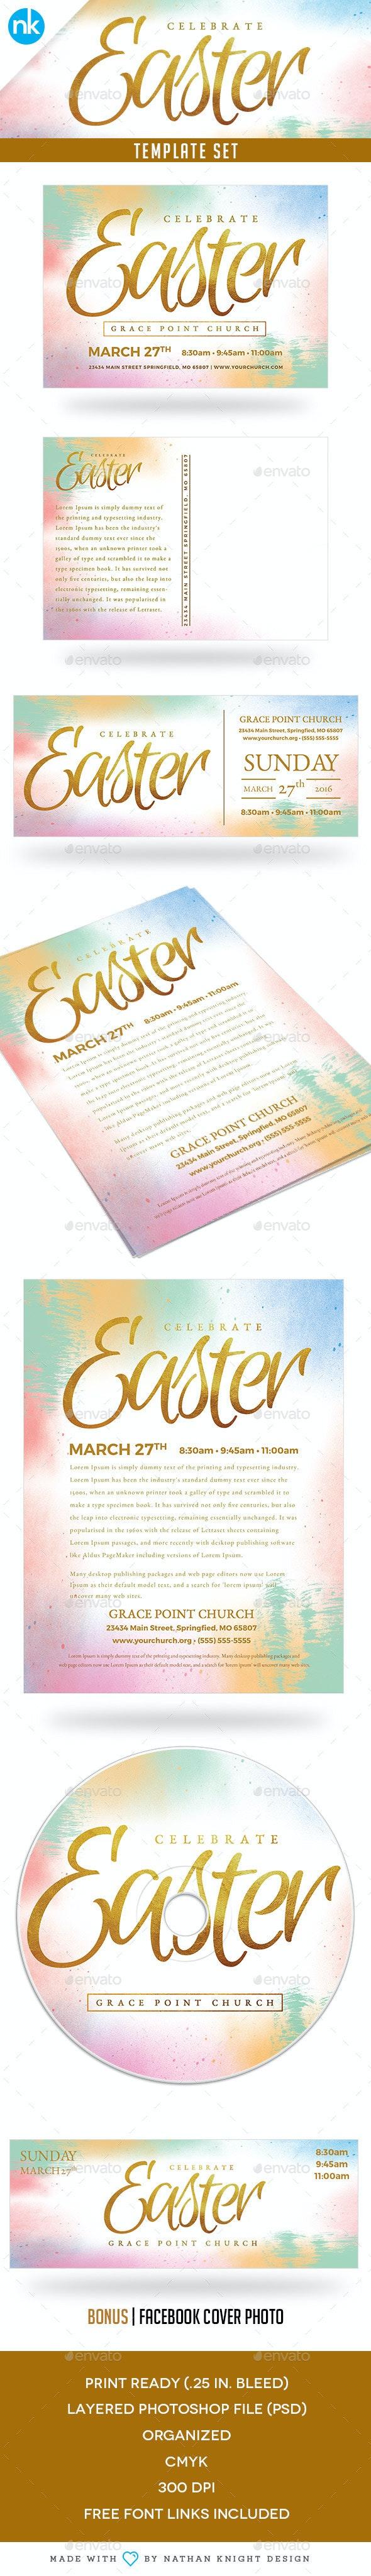 Easter Sunday Church Template Set - Celebrate - Church Flyers